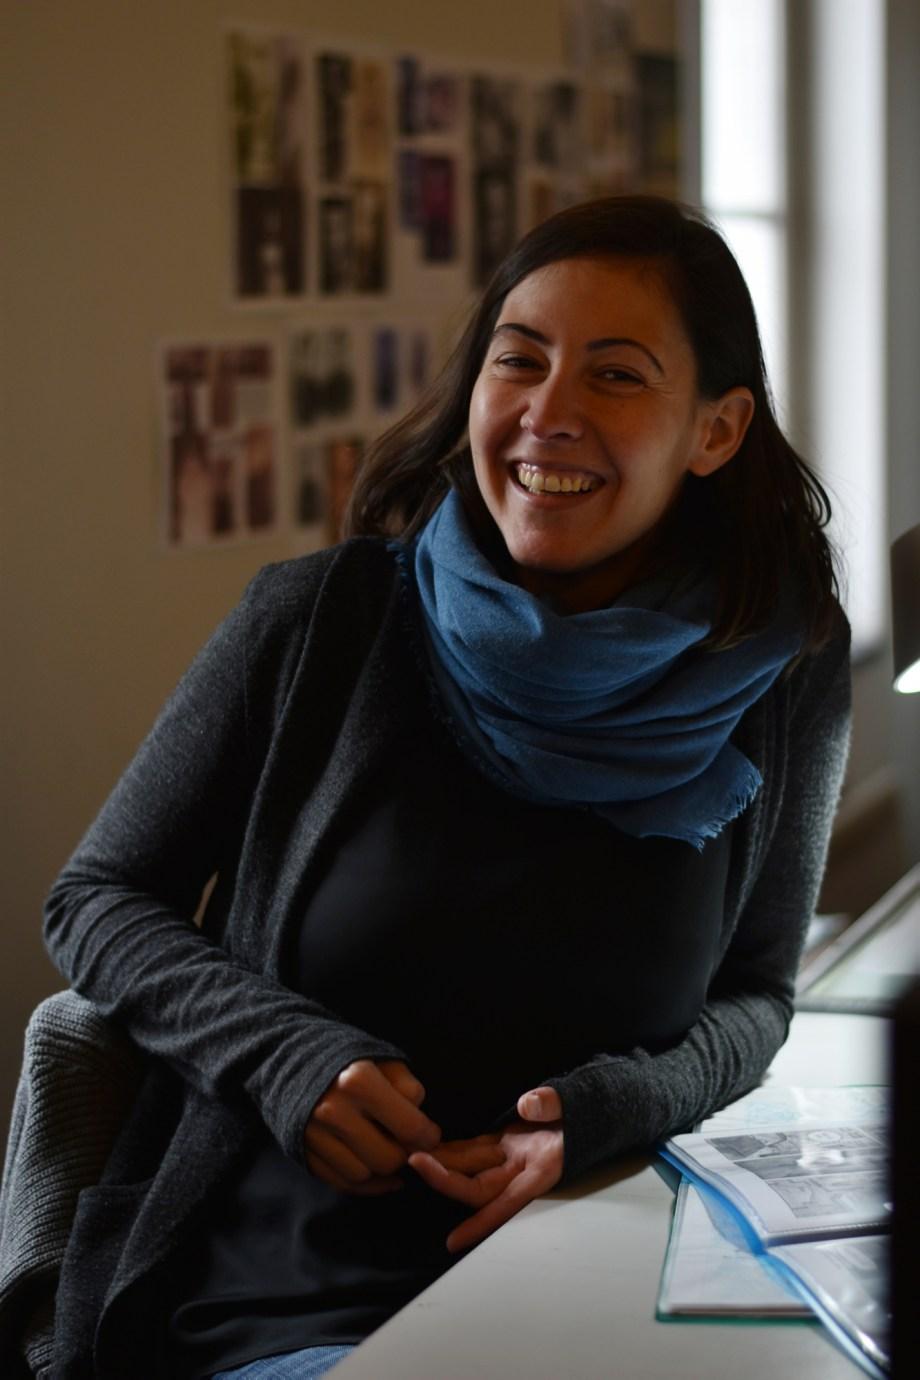 Alicia Pena dans son atelier